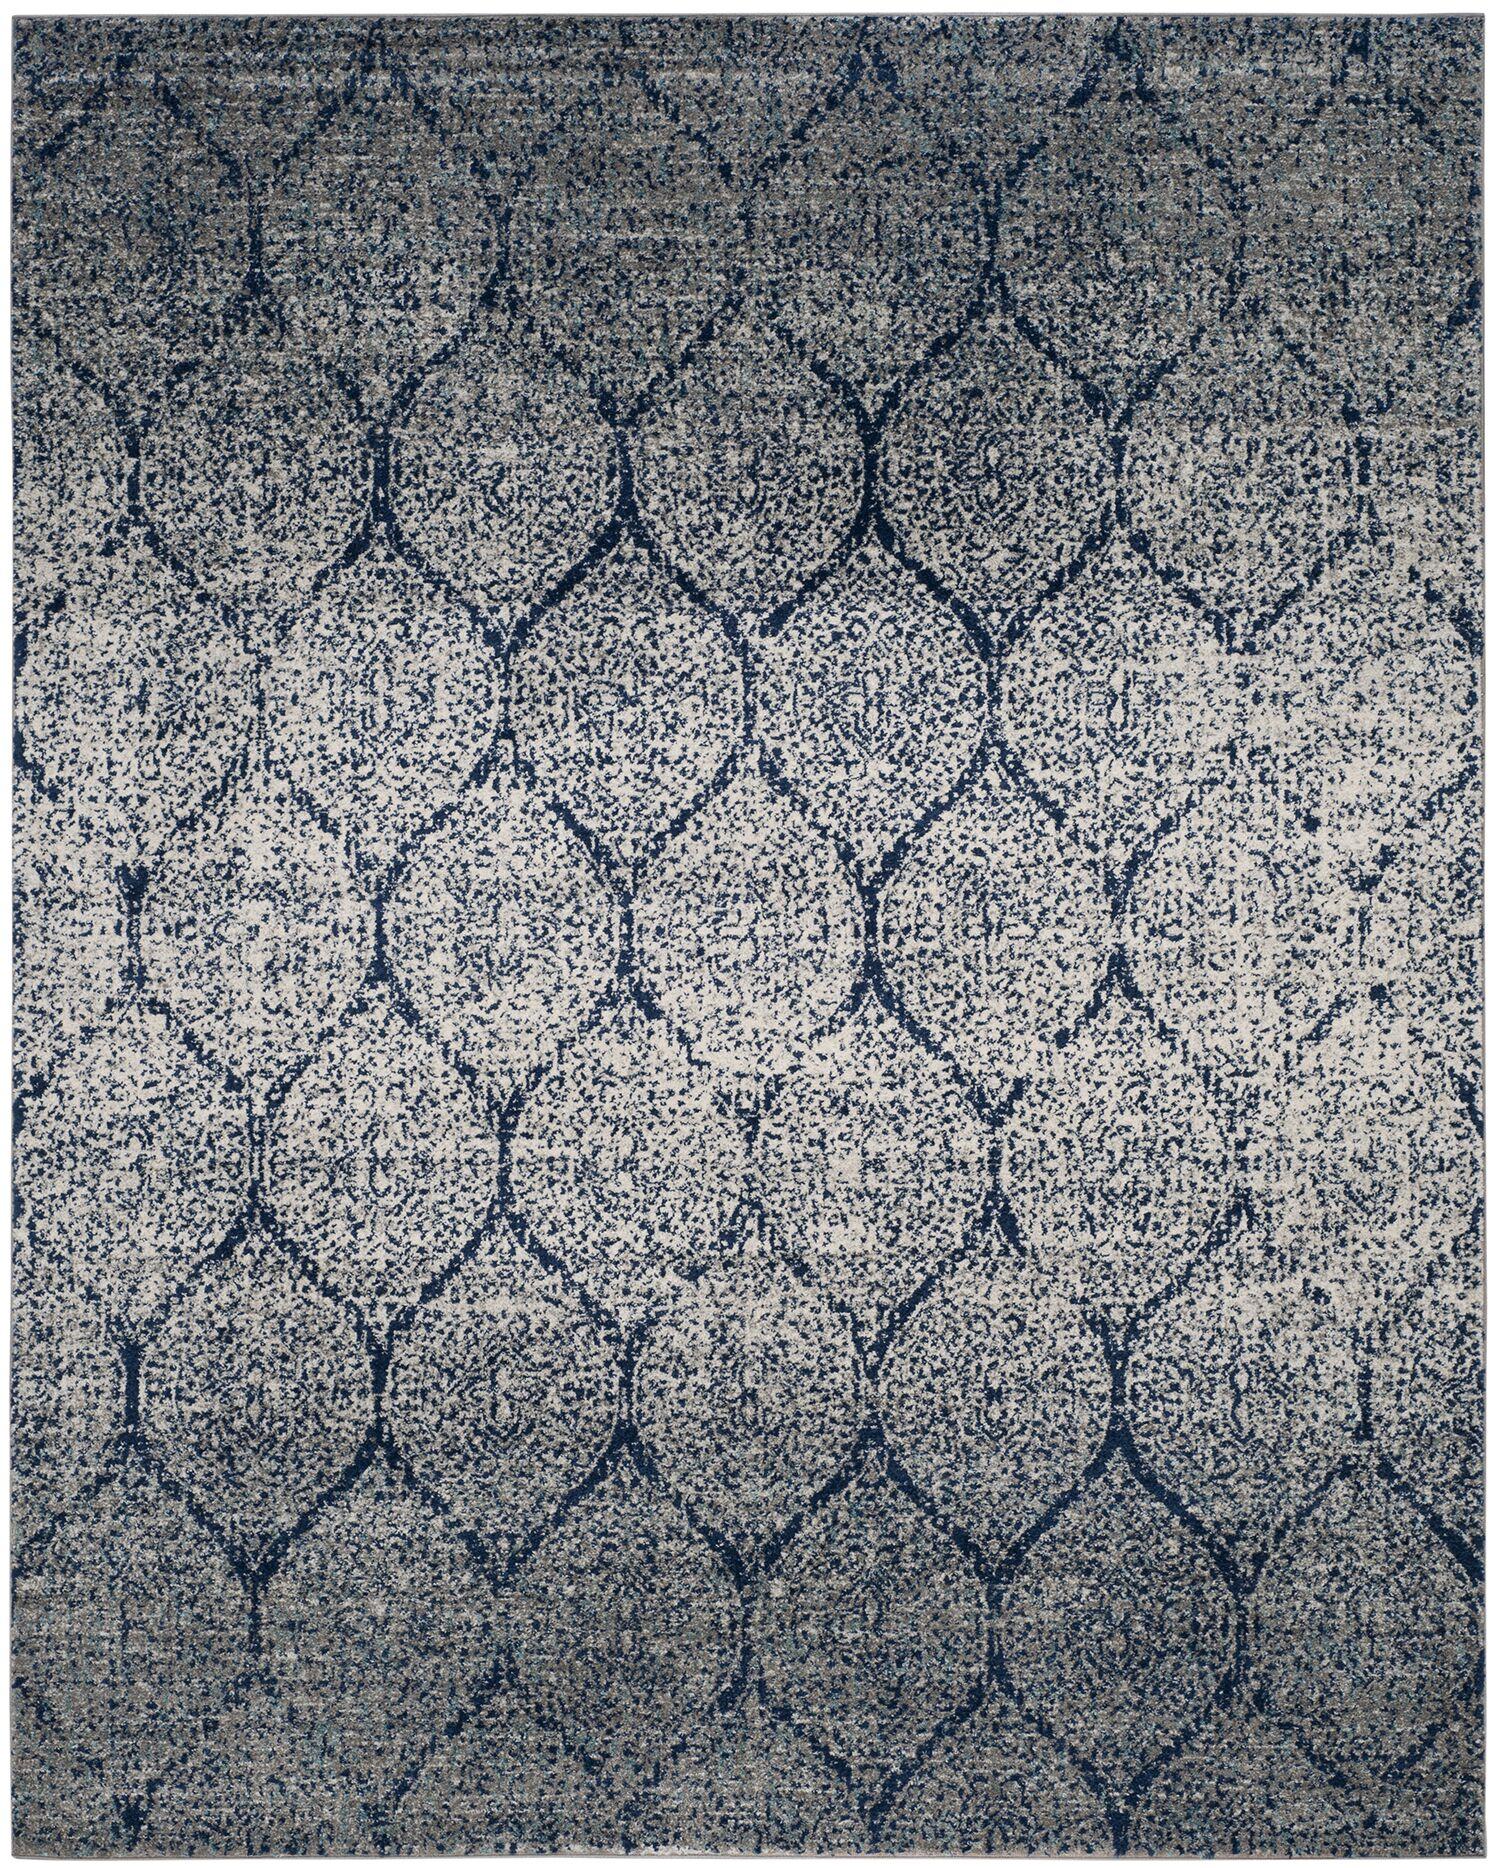 Grieve Blue/Gray Area Rug Rug Size: Rectangle 6'7